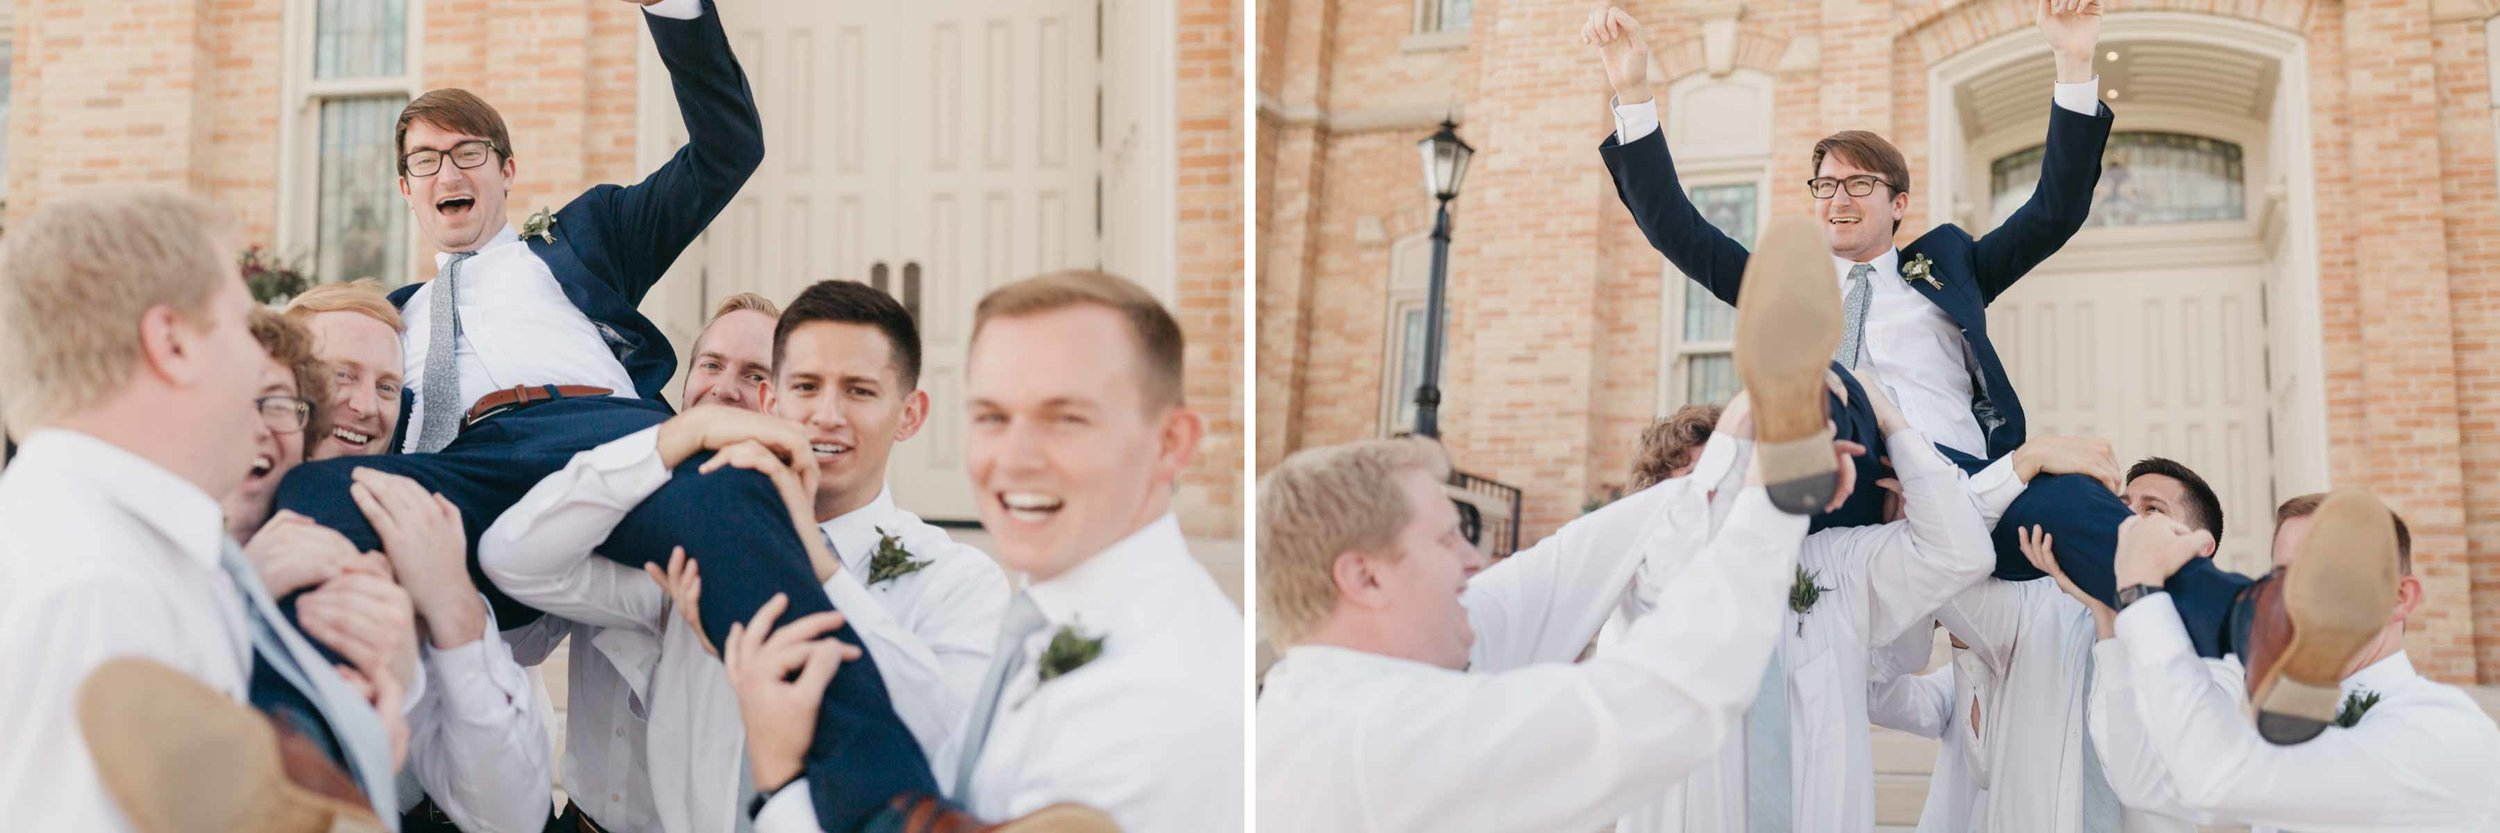 Provo-Wedding-Photographer-15.jpg